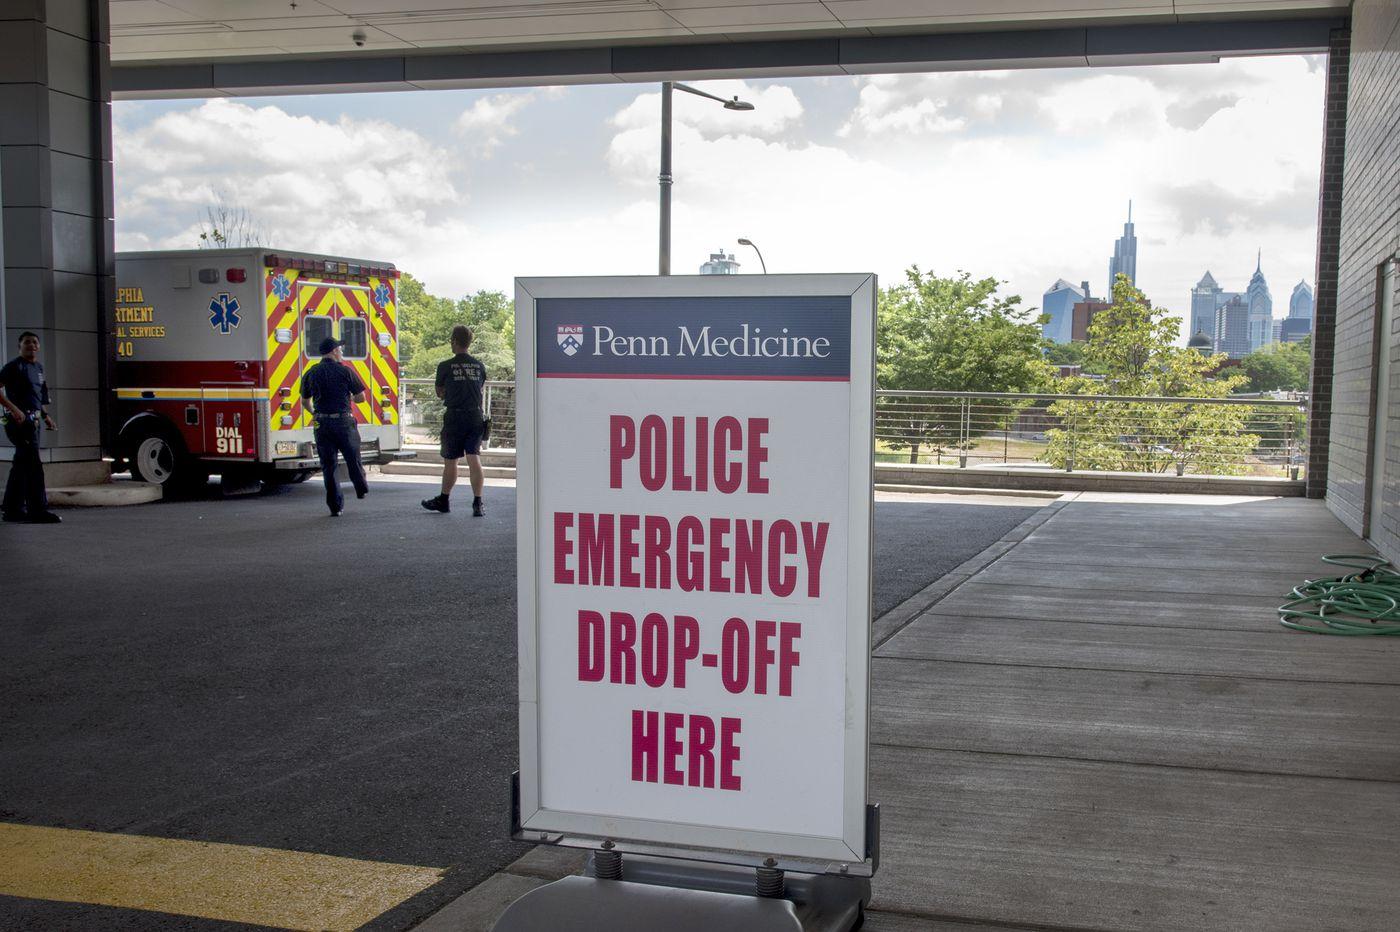 Penn dedicates police emergency drop-off lane for gunshot victims